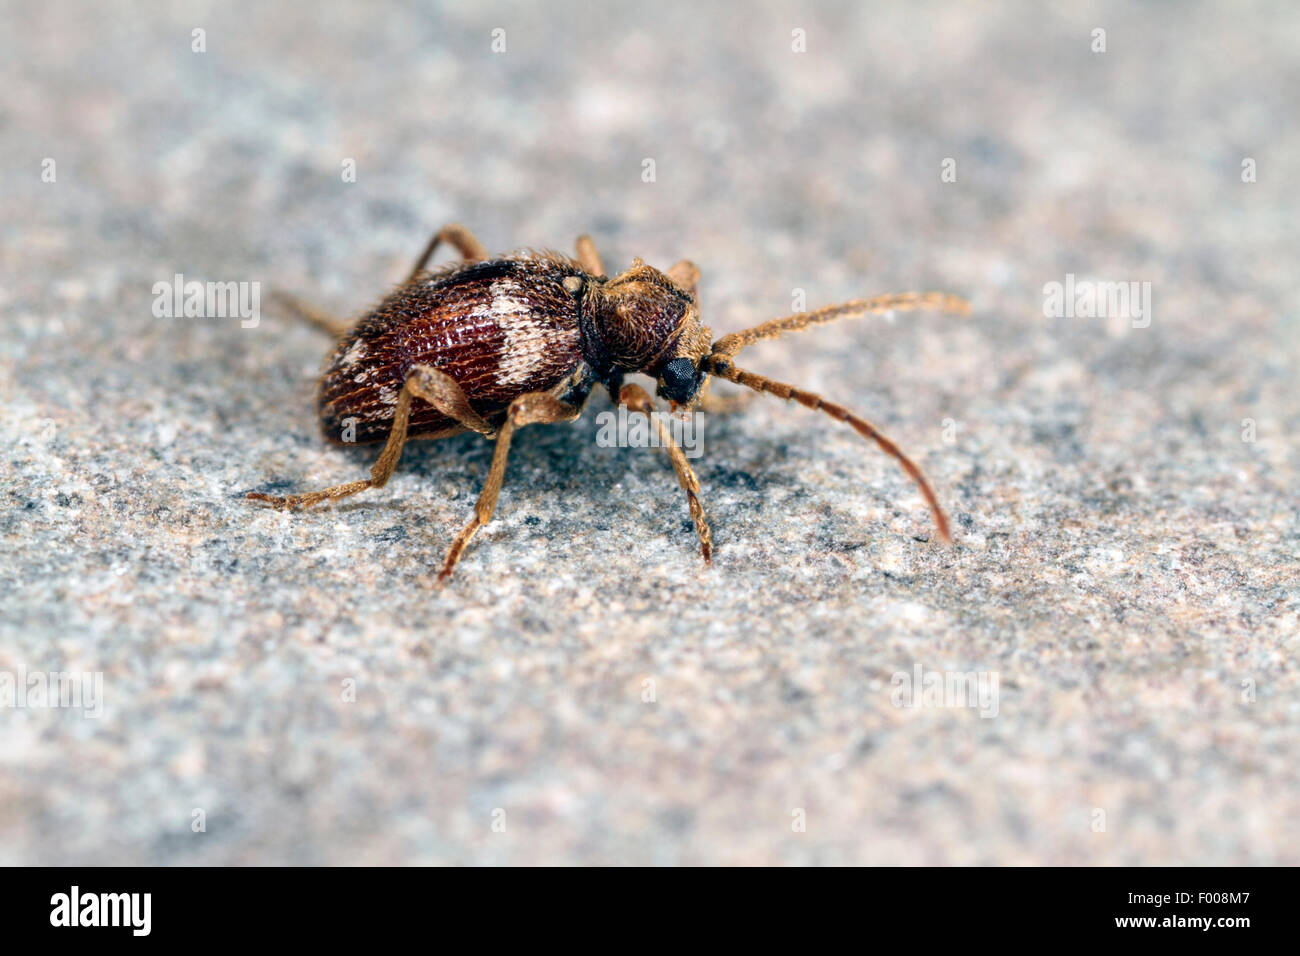 Furniture beetle stockfotos furniture beetle bilder alamy for Boden deutschland